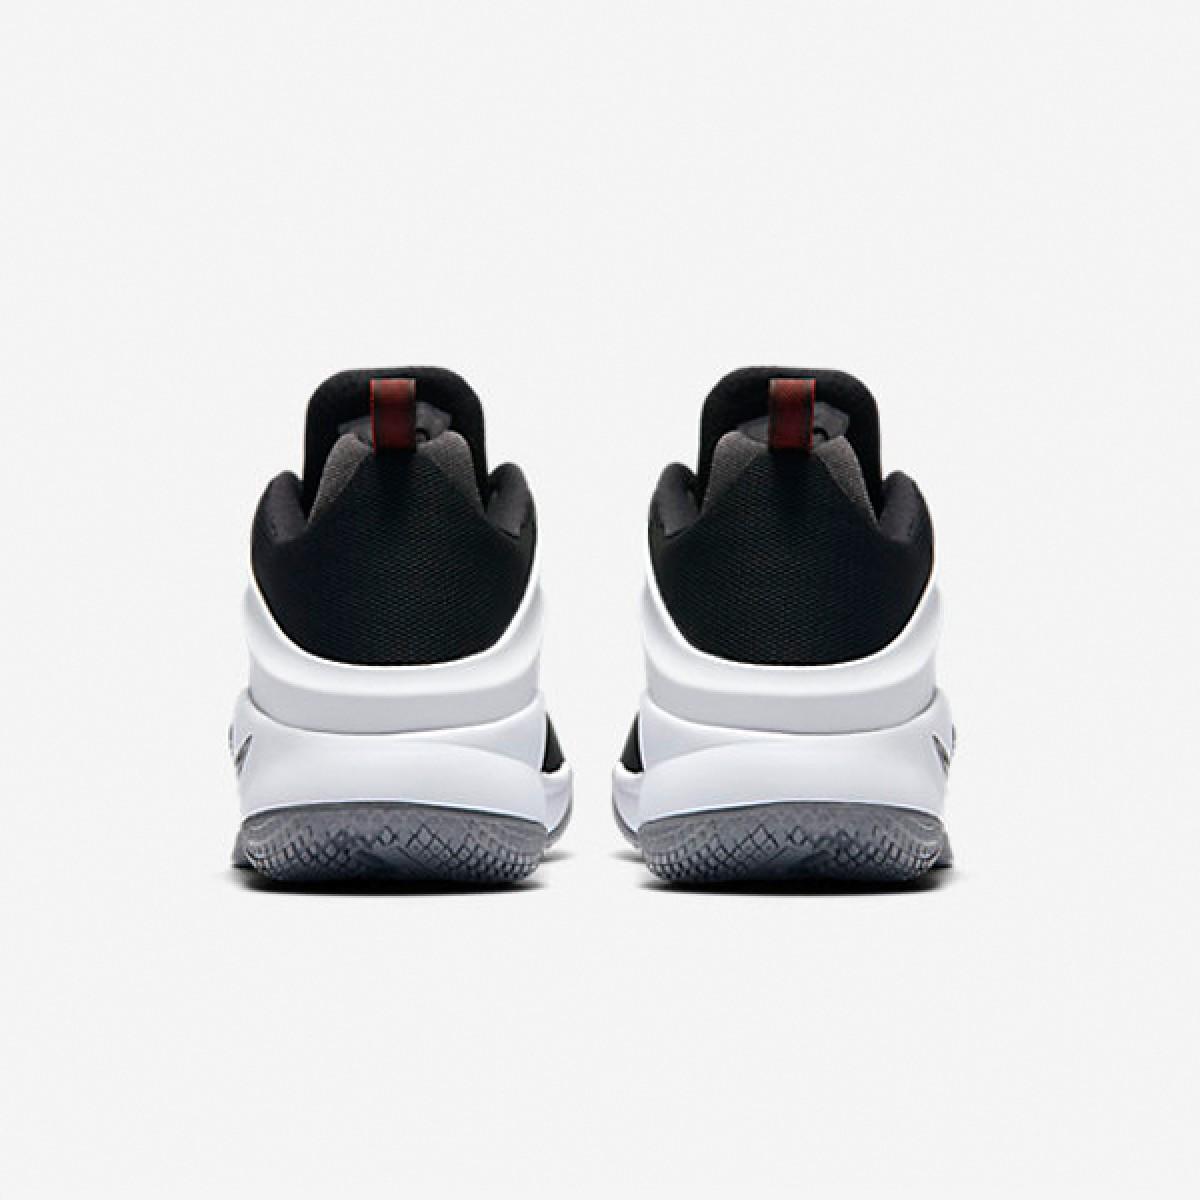 Nike Zoom Witness 'Black/White' 860272-002